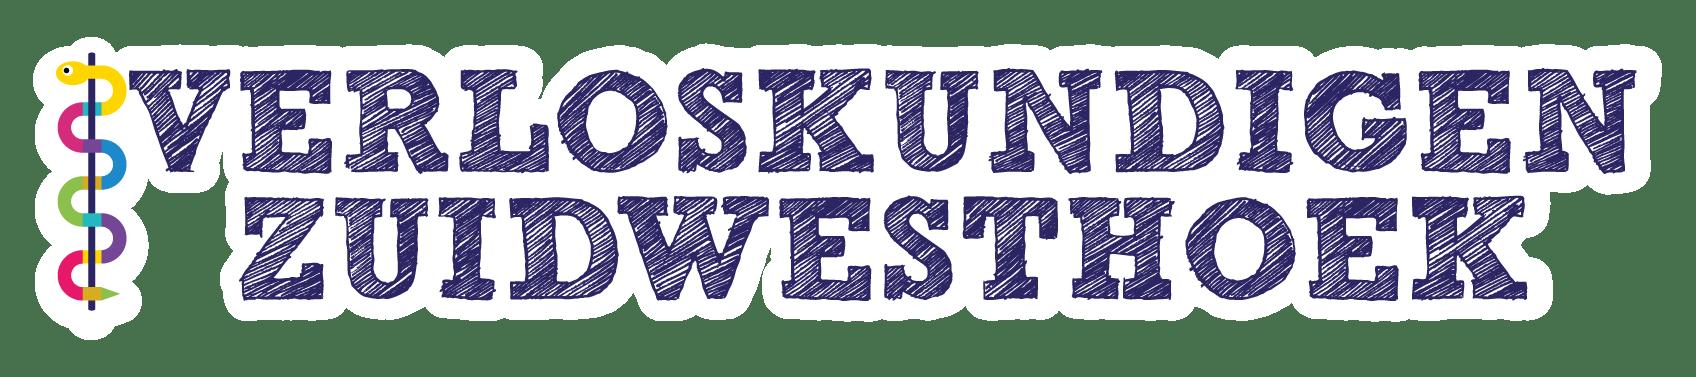 Verloskundigen Zuidwesthoek Logo